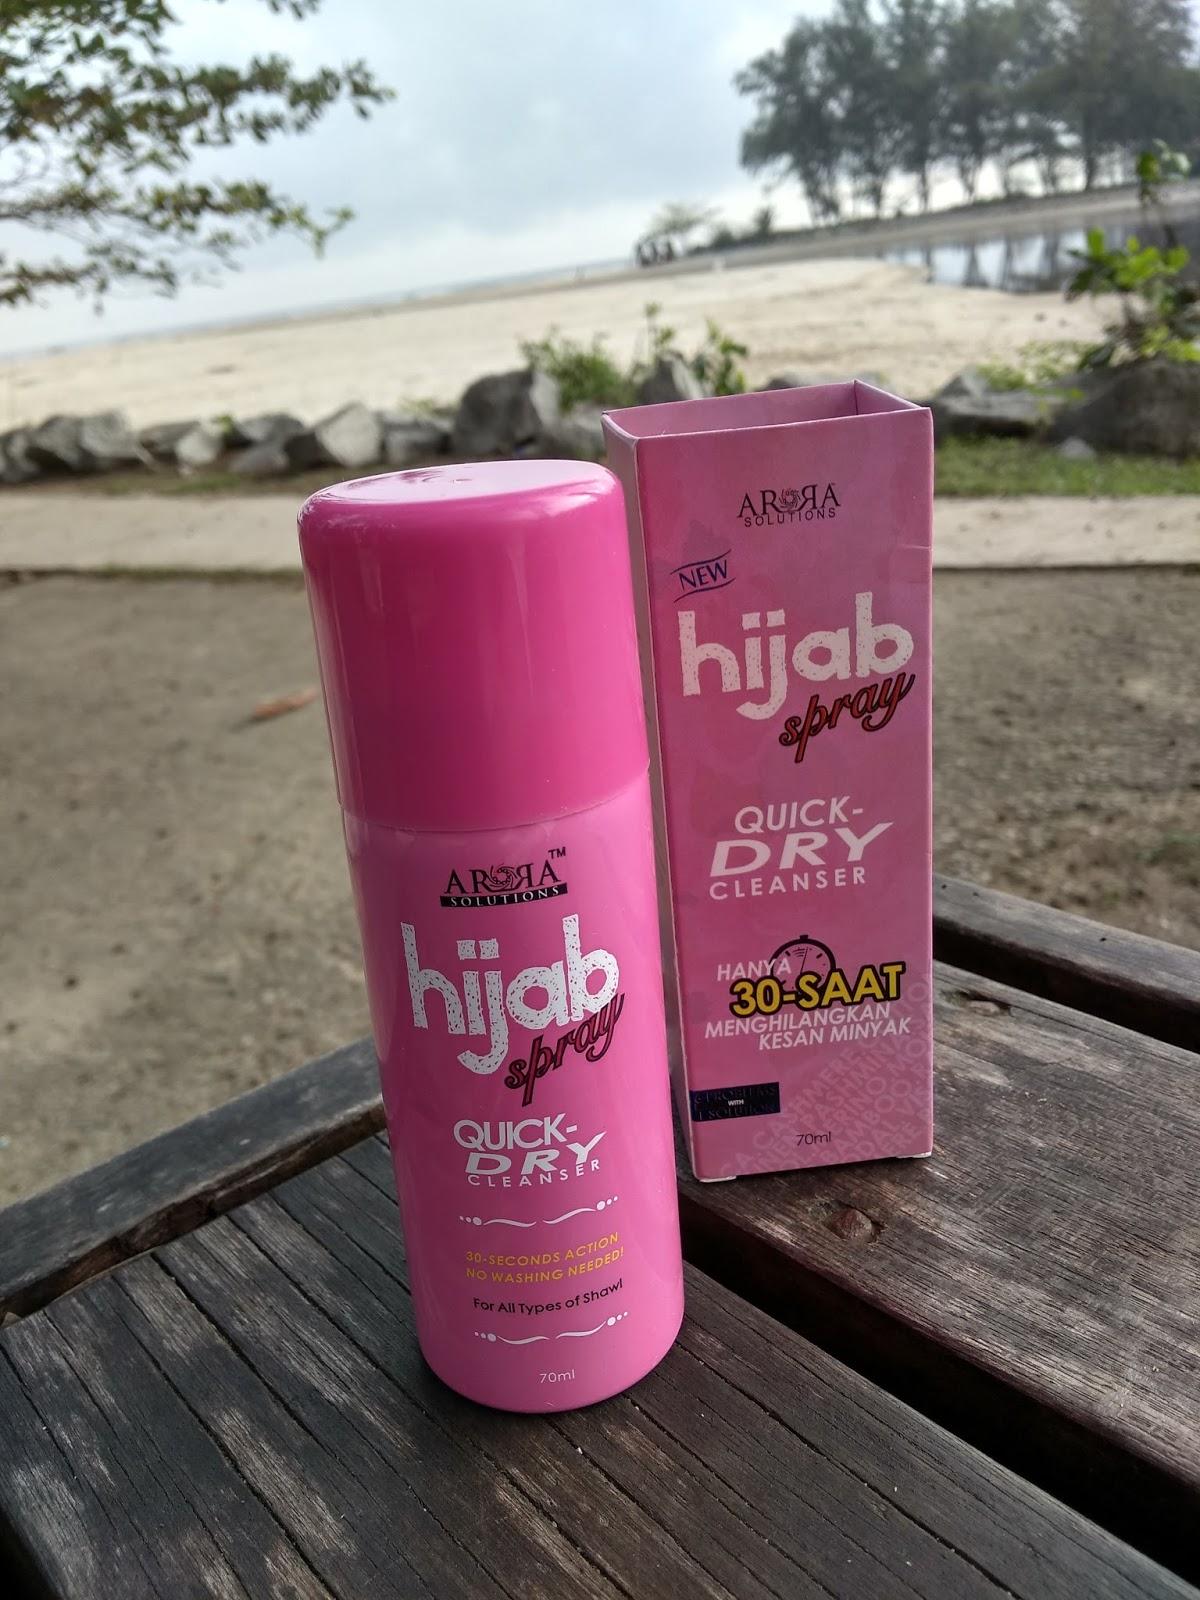 Hijab Spray Arora - Hijab bebas kotoran dalam 30 Saat!